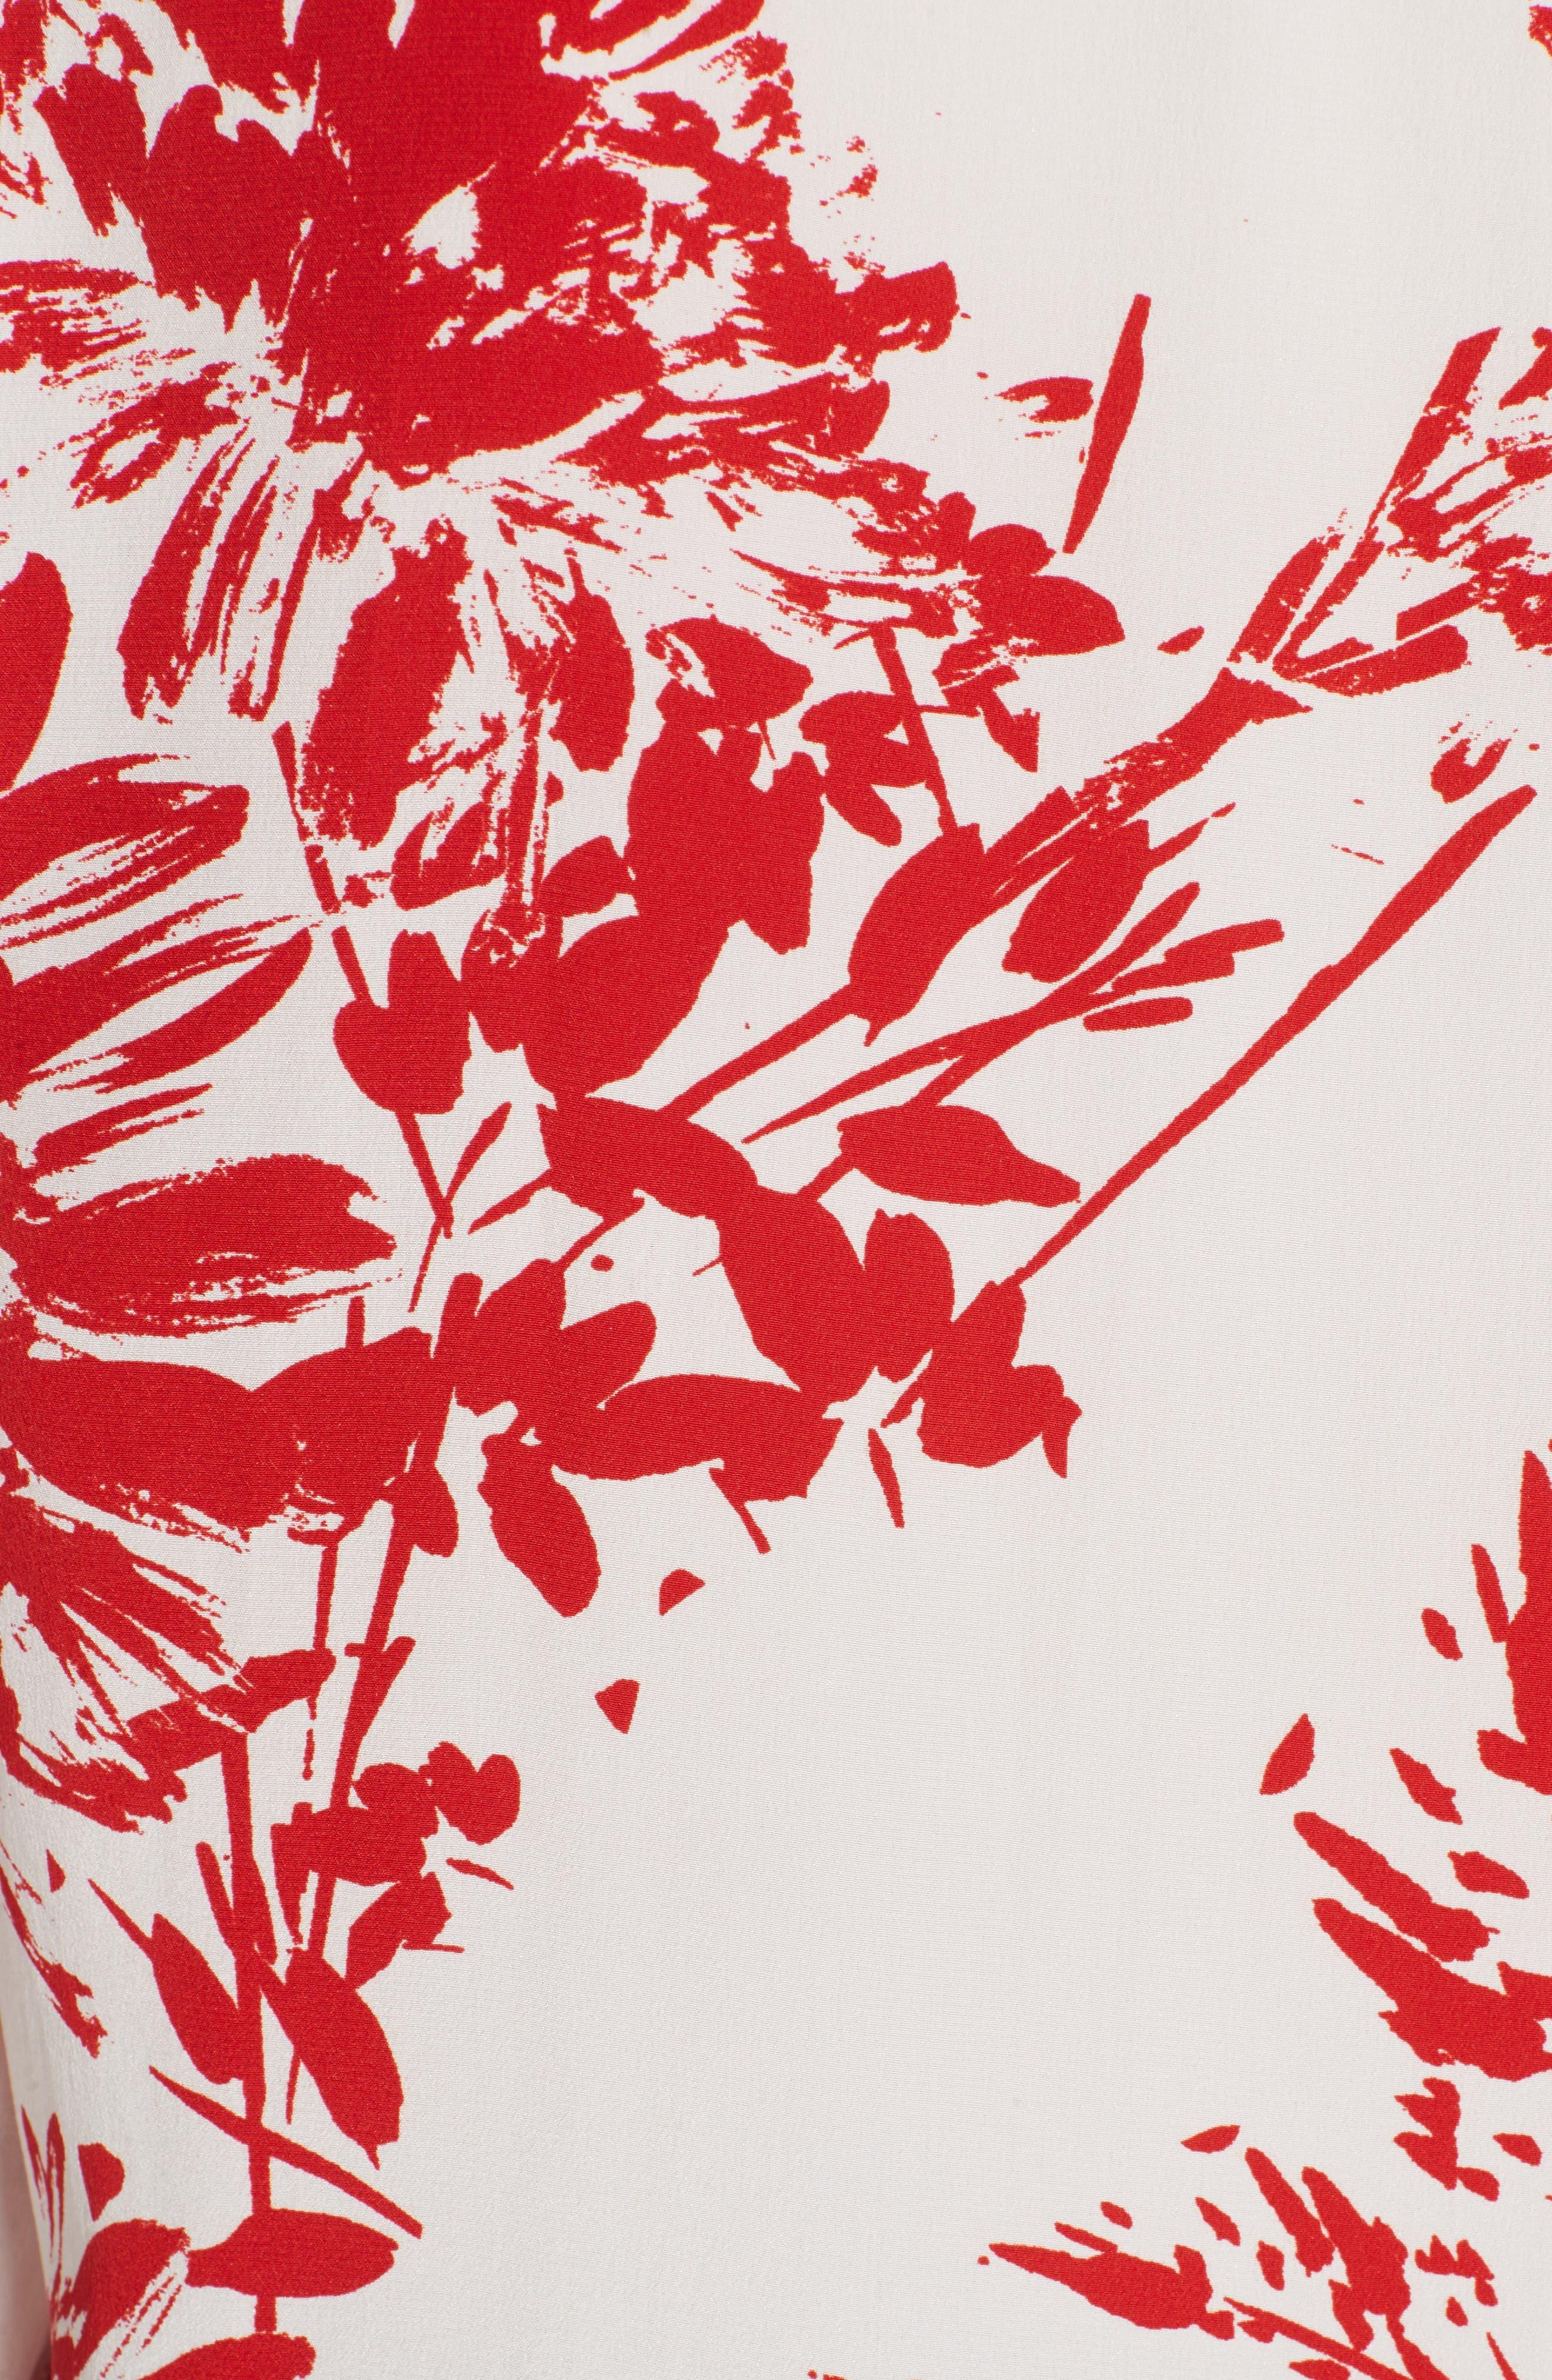 Brett Silk Blend Shirt,                             Alternate thumbnail 5, color,                             NATURAL WHITE BLOOD MOON